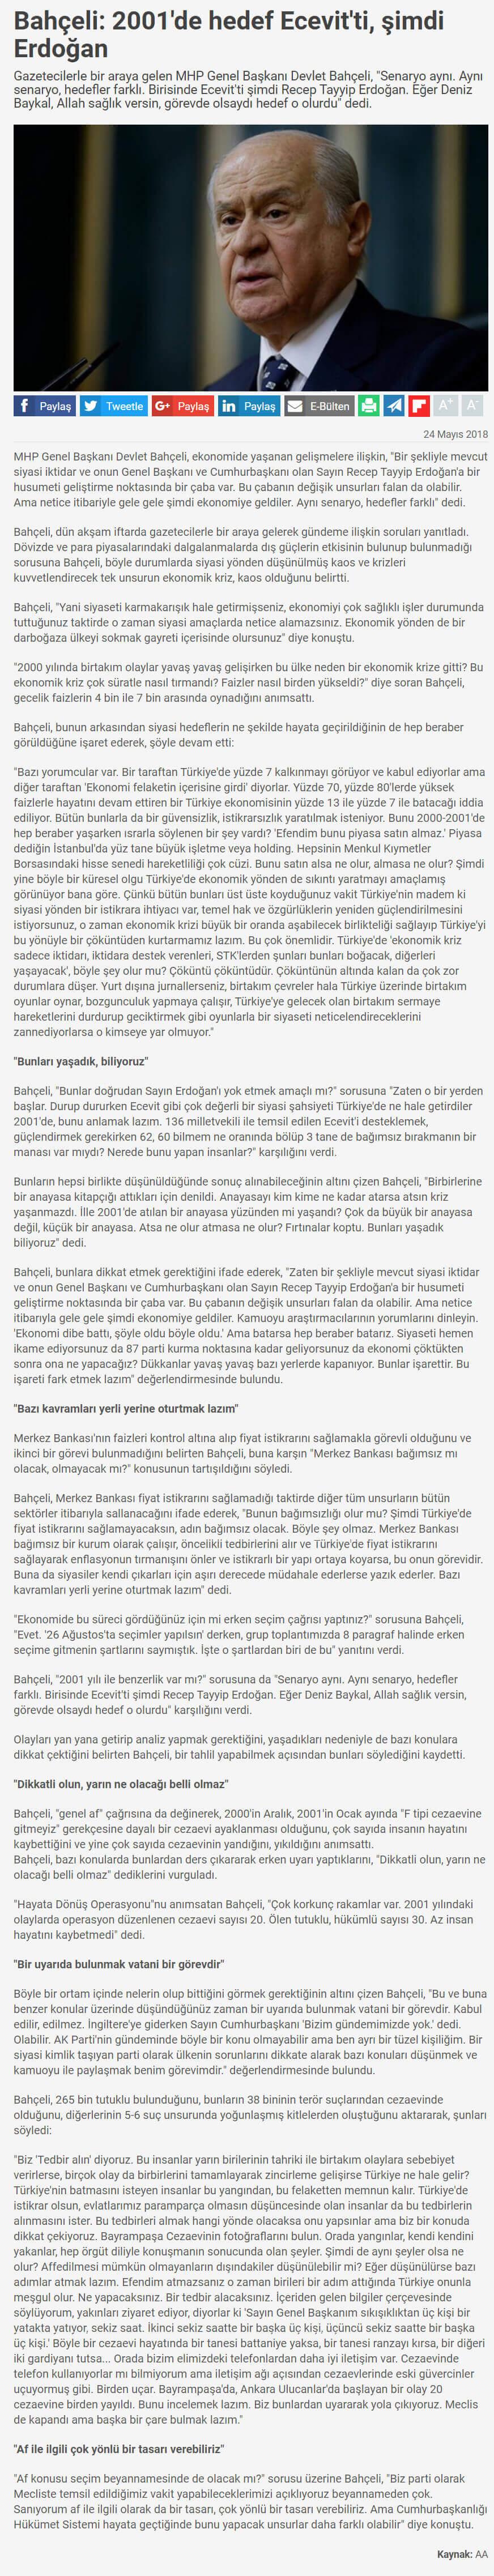 screencapture-dunya-gundem-bahceli-2001de-hedef-ecevitti-simdi-erdogan-haberi-416899-2018-05-24-13_38_13 (1)